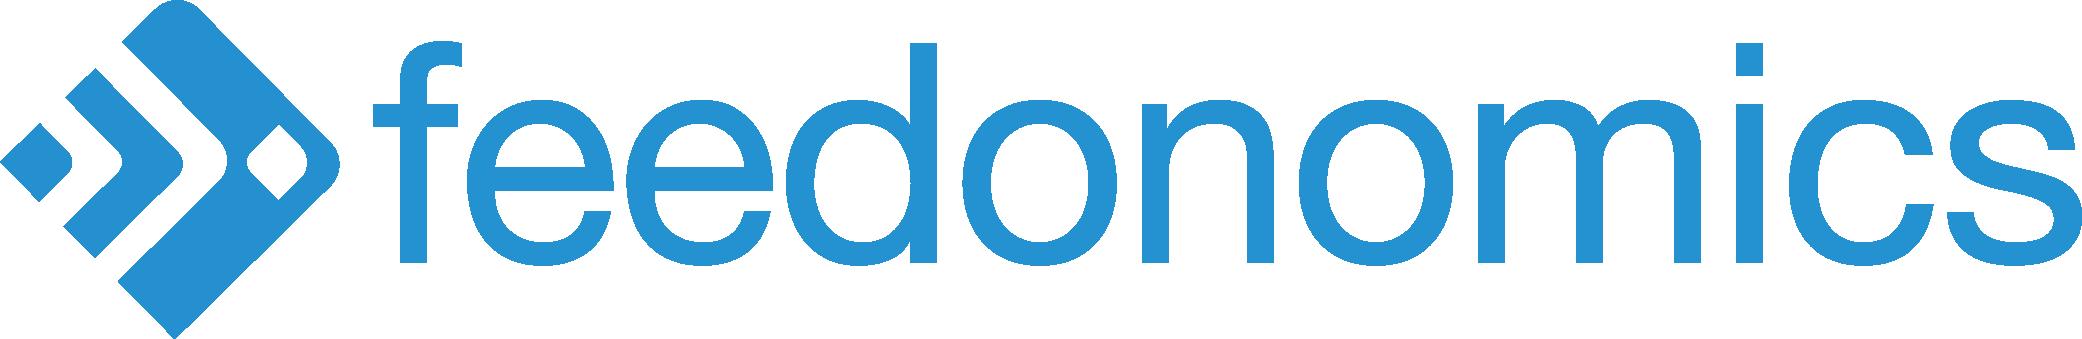 Feedonomics Connector - Kensium Solutions